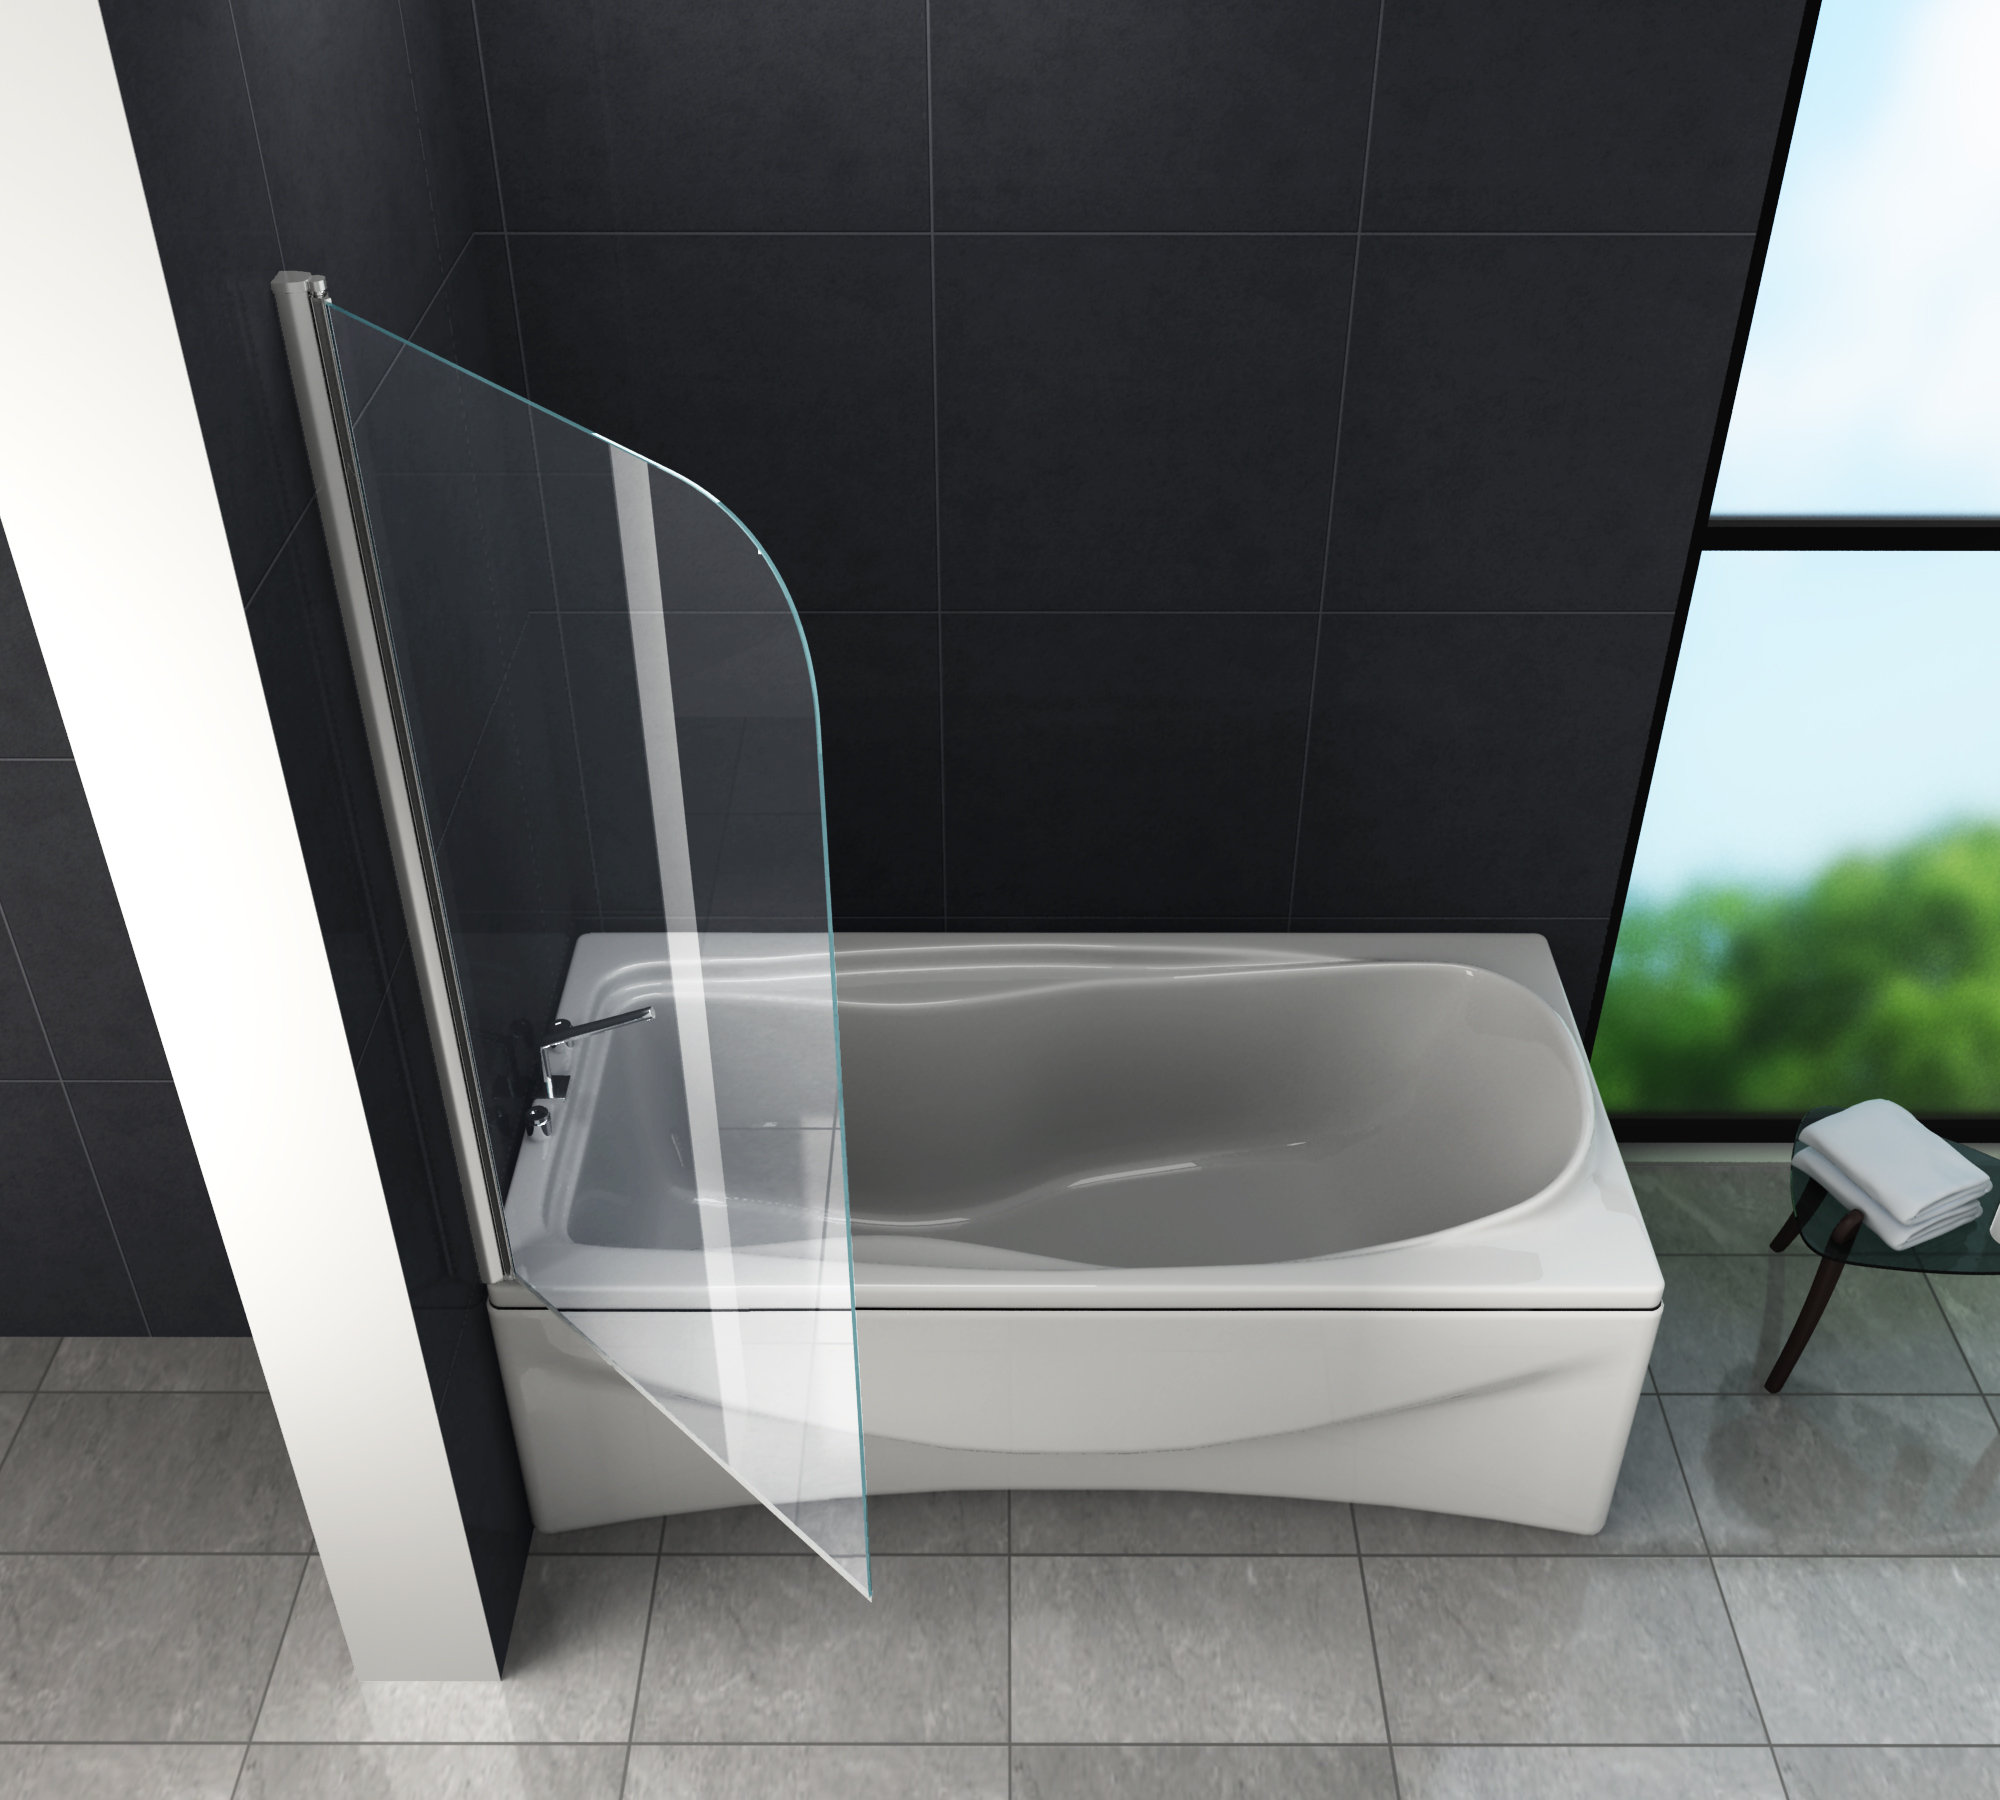 Duschtrennwand Wellness 80 X 140 Badewanne Glasdeals